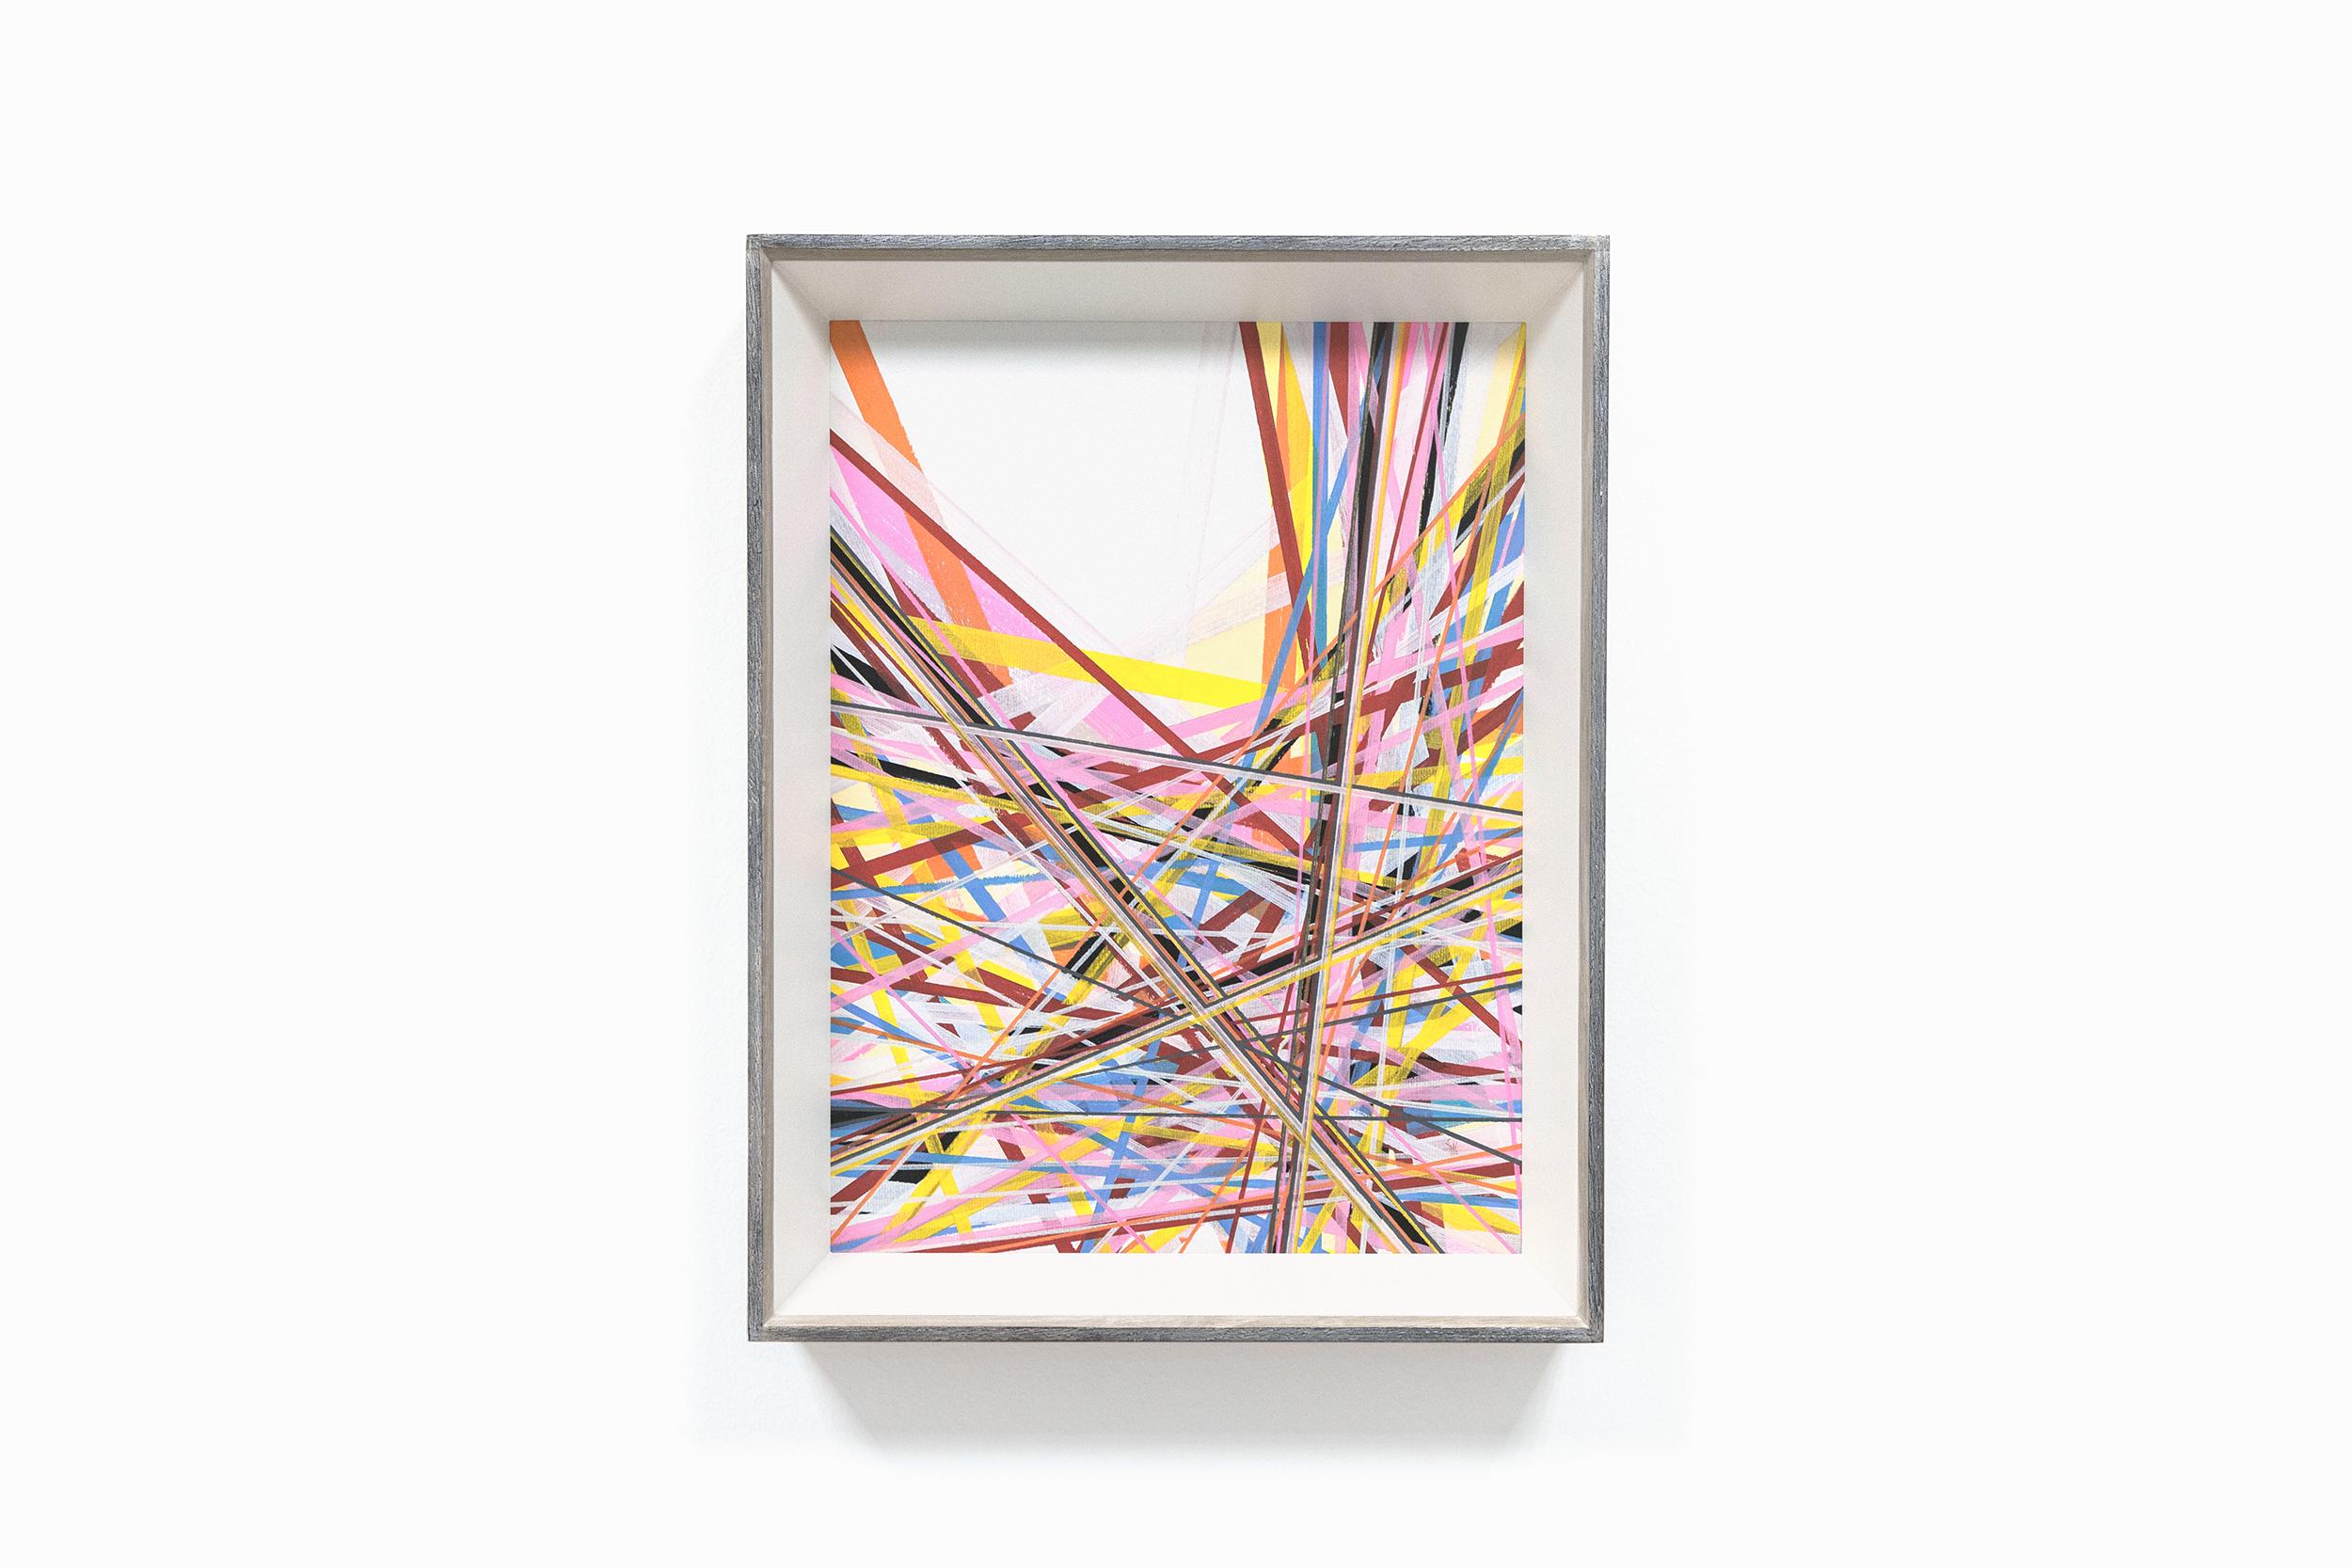 bonjourmolotov+Coming+soon+series+Illustration+Ilustracao+painting+pintura+acrylic+acrílico+canvas+tela+paper+cardboard+mdf+Andre+Gigante+01B.jpg